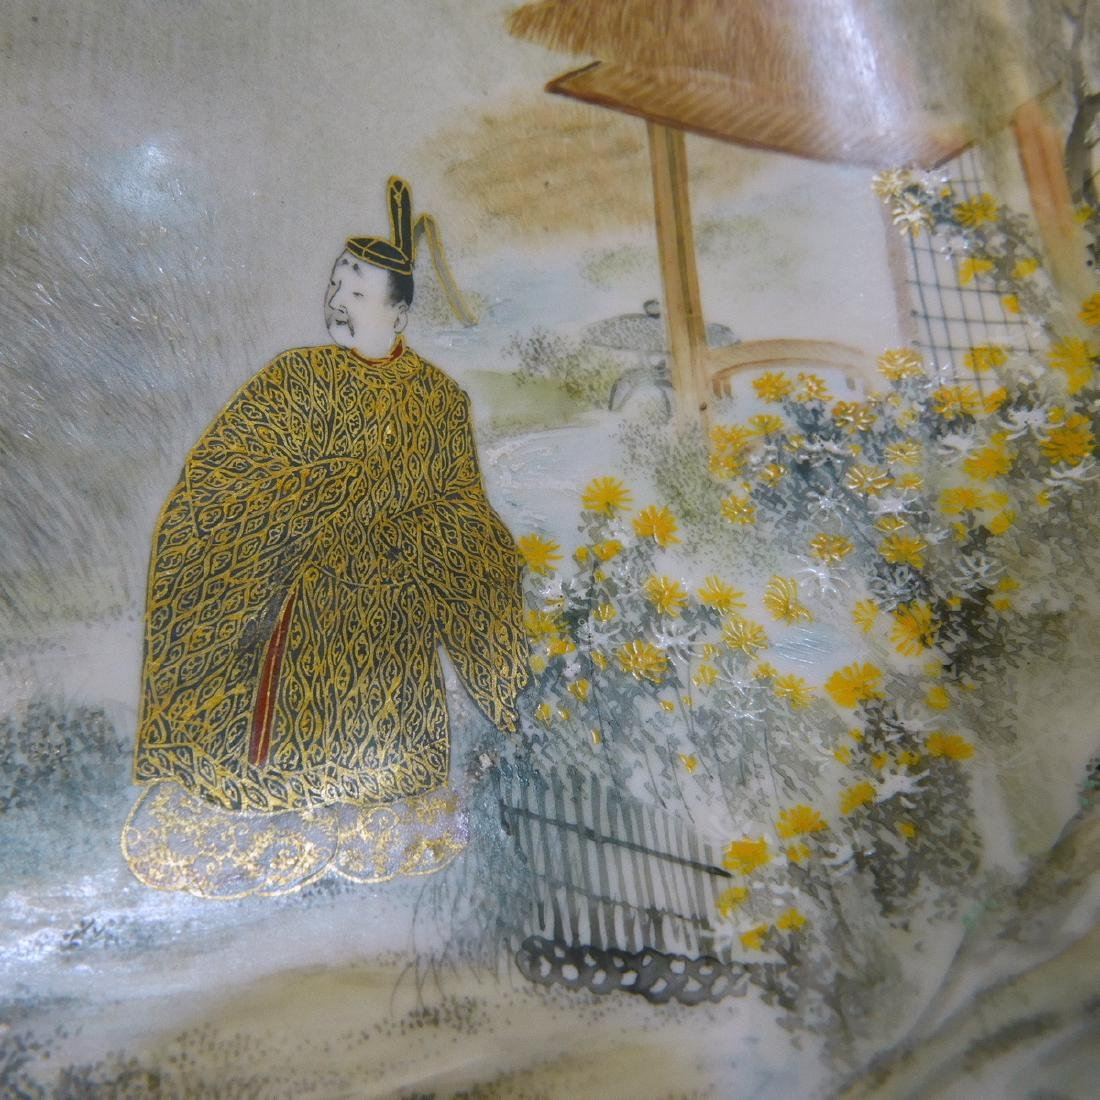 FINEST JAPANESE ANTIQUE KUTANI BOWL - MEIJI PERIOD - 4